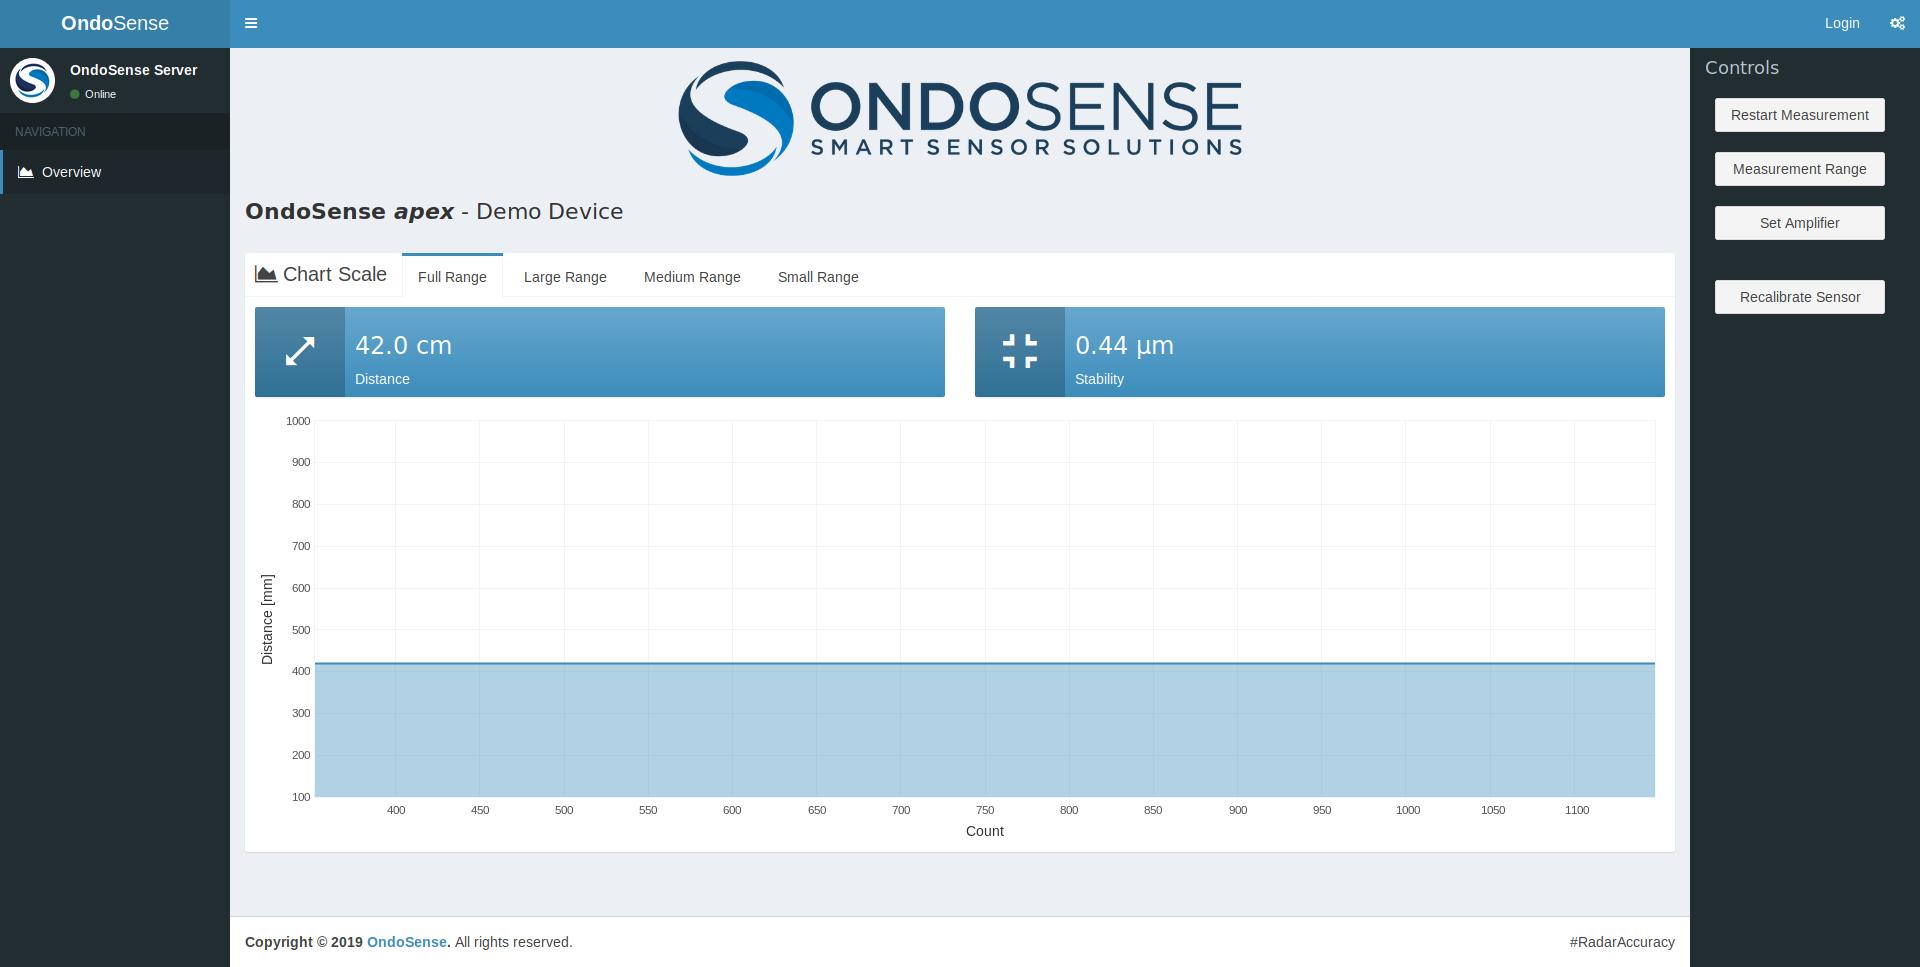 News - OndoSense